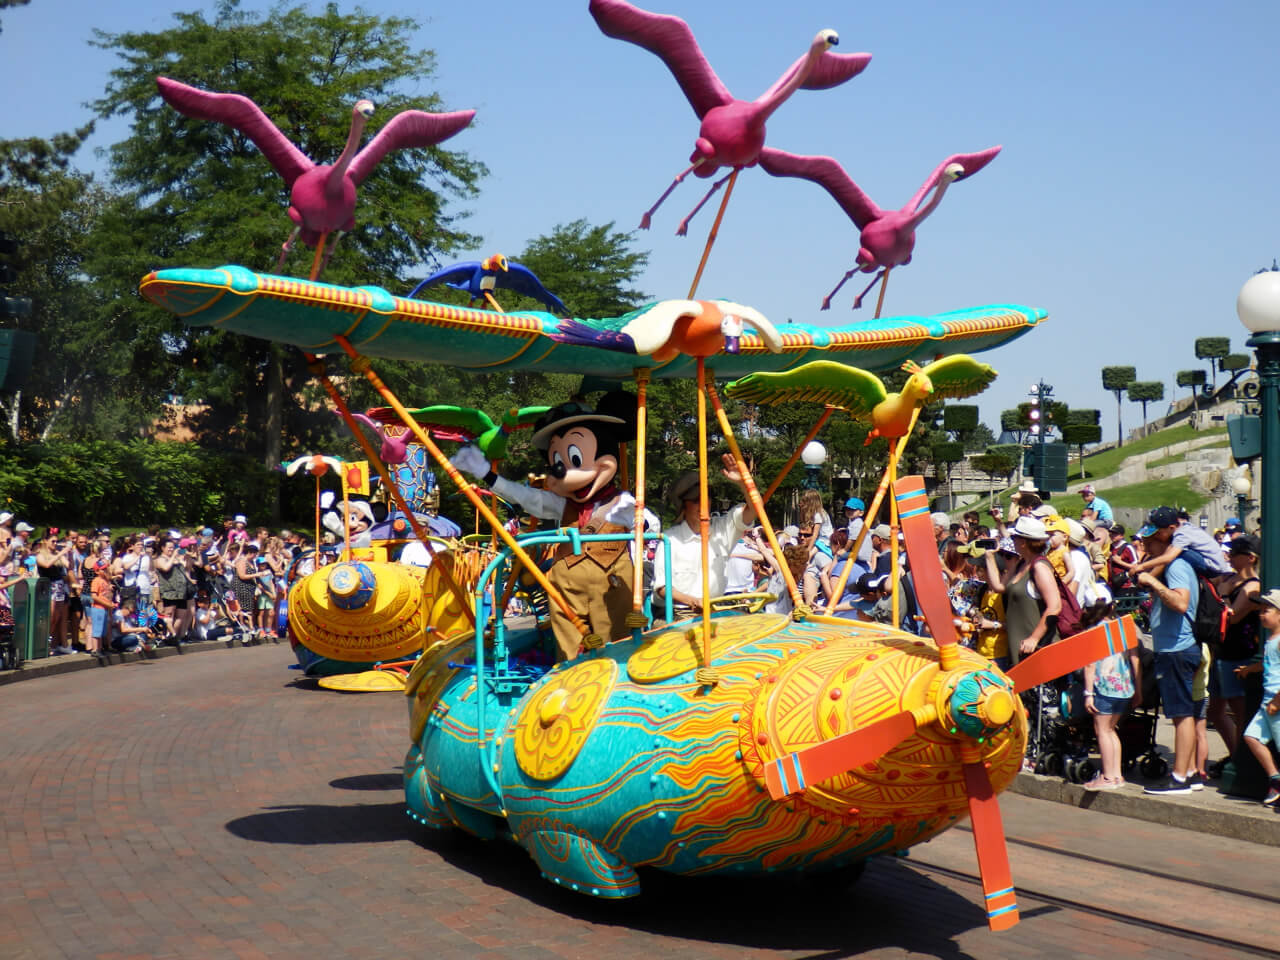 Mickey Mouse en el show Jungle Book Jive de Disneyland Paris